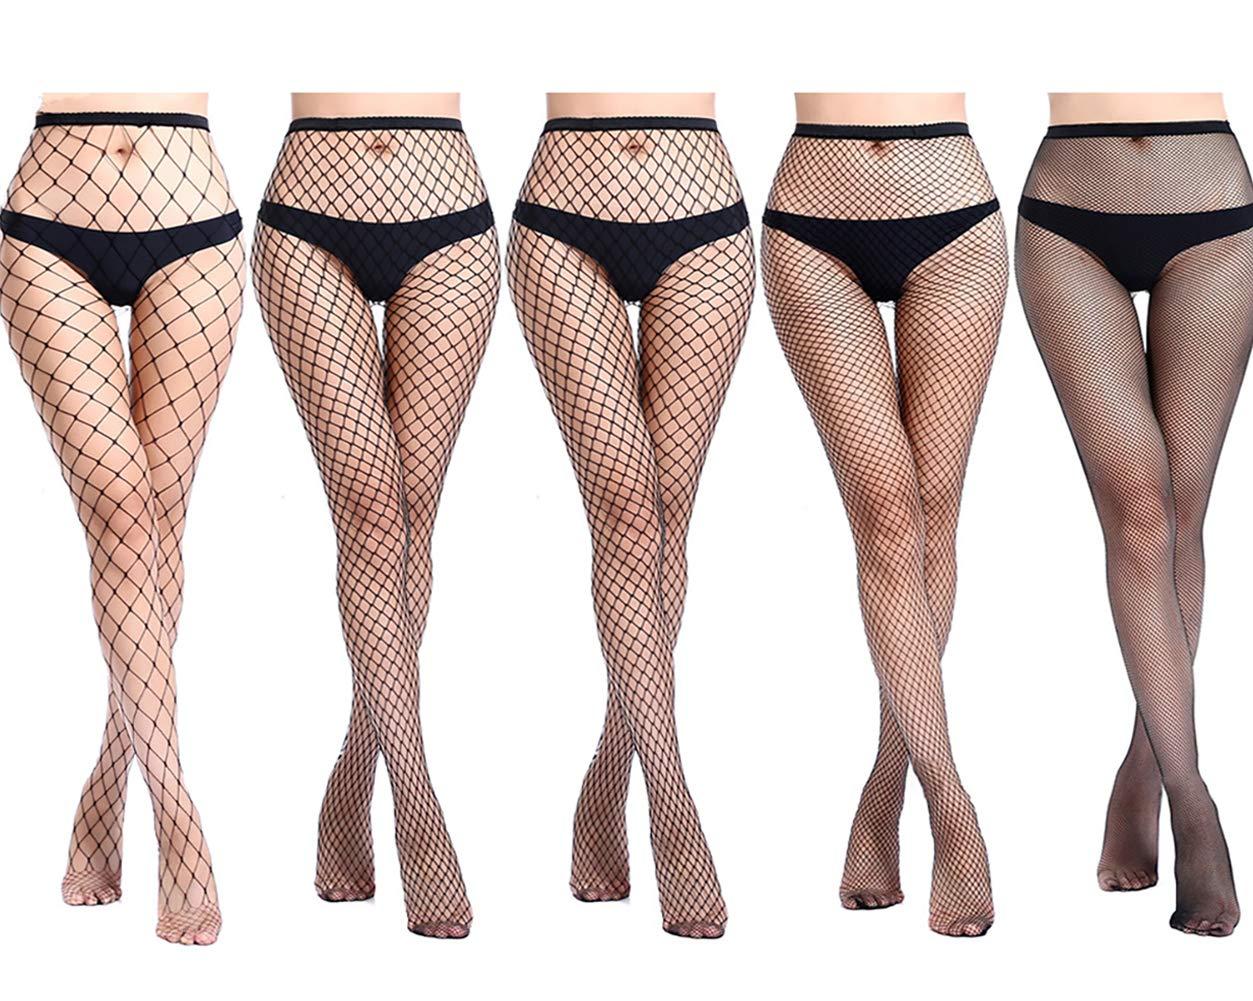 Amandir 4-5 Pairs Fishnet Stockings Womens Lace Mesh Patterned Fishnet Leggings Tights Net Pantyhose